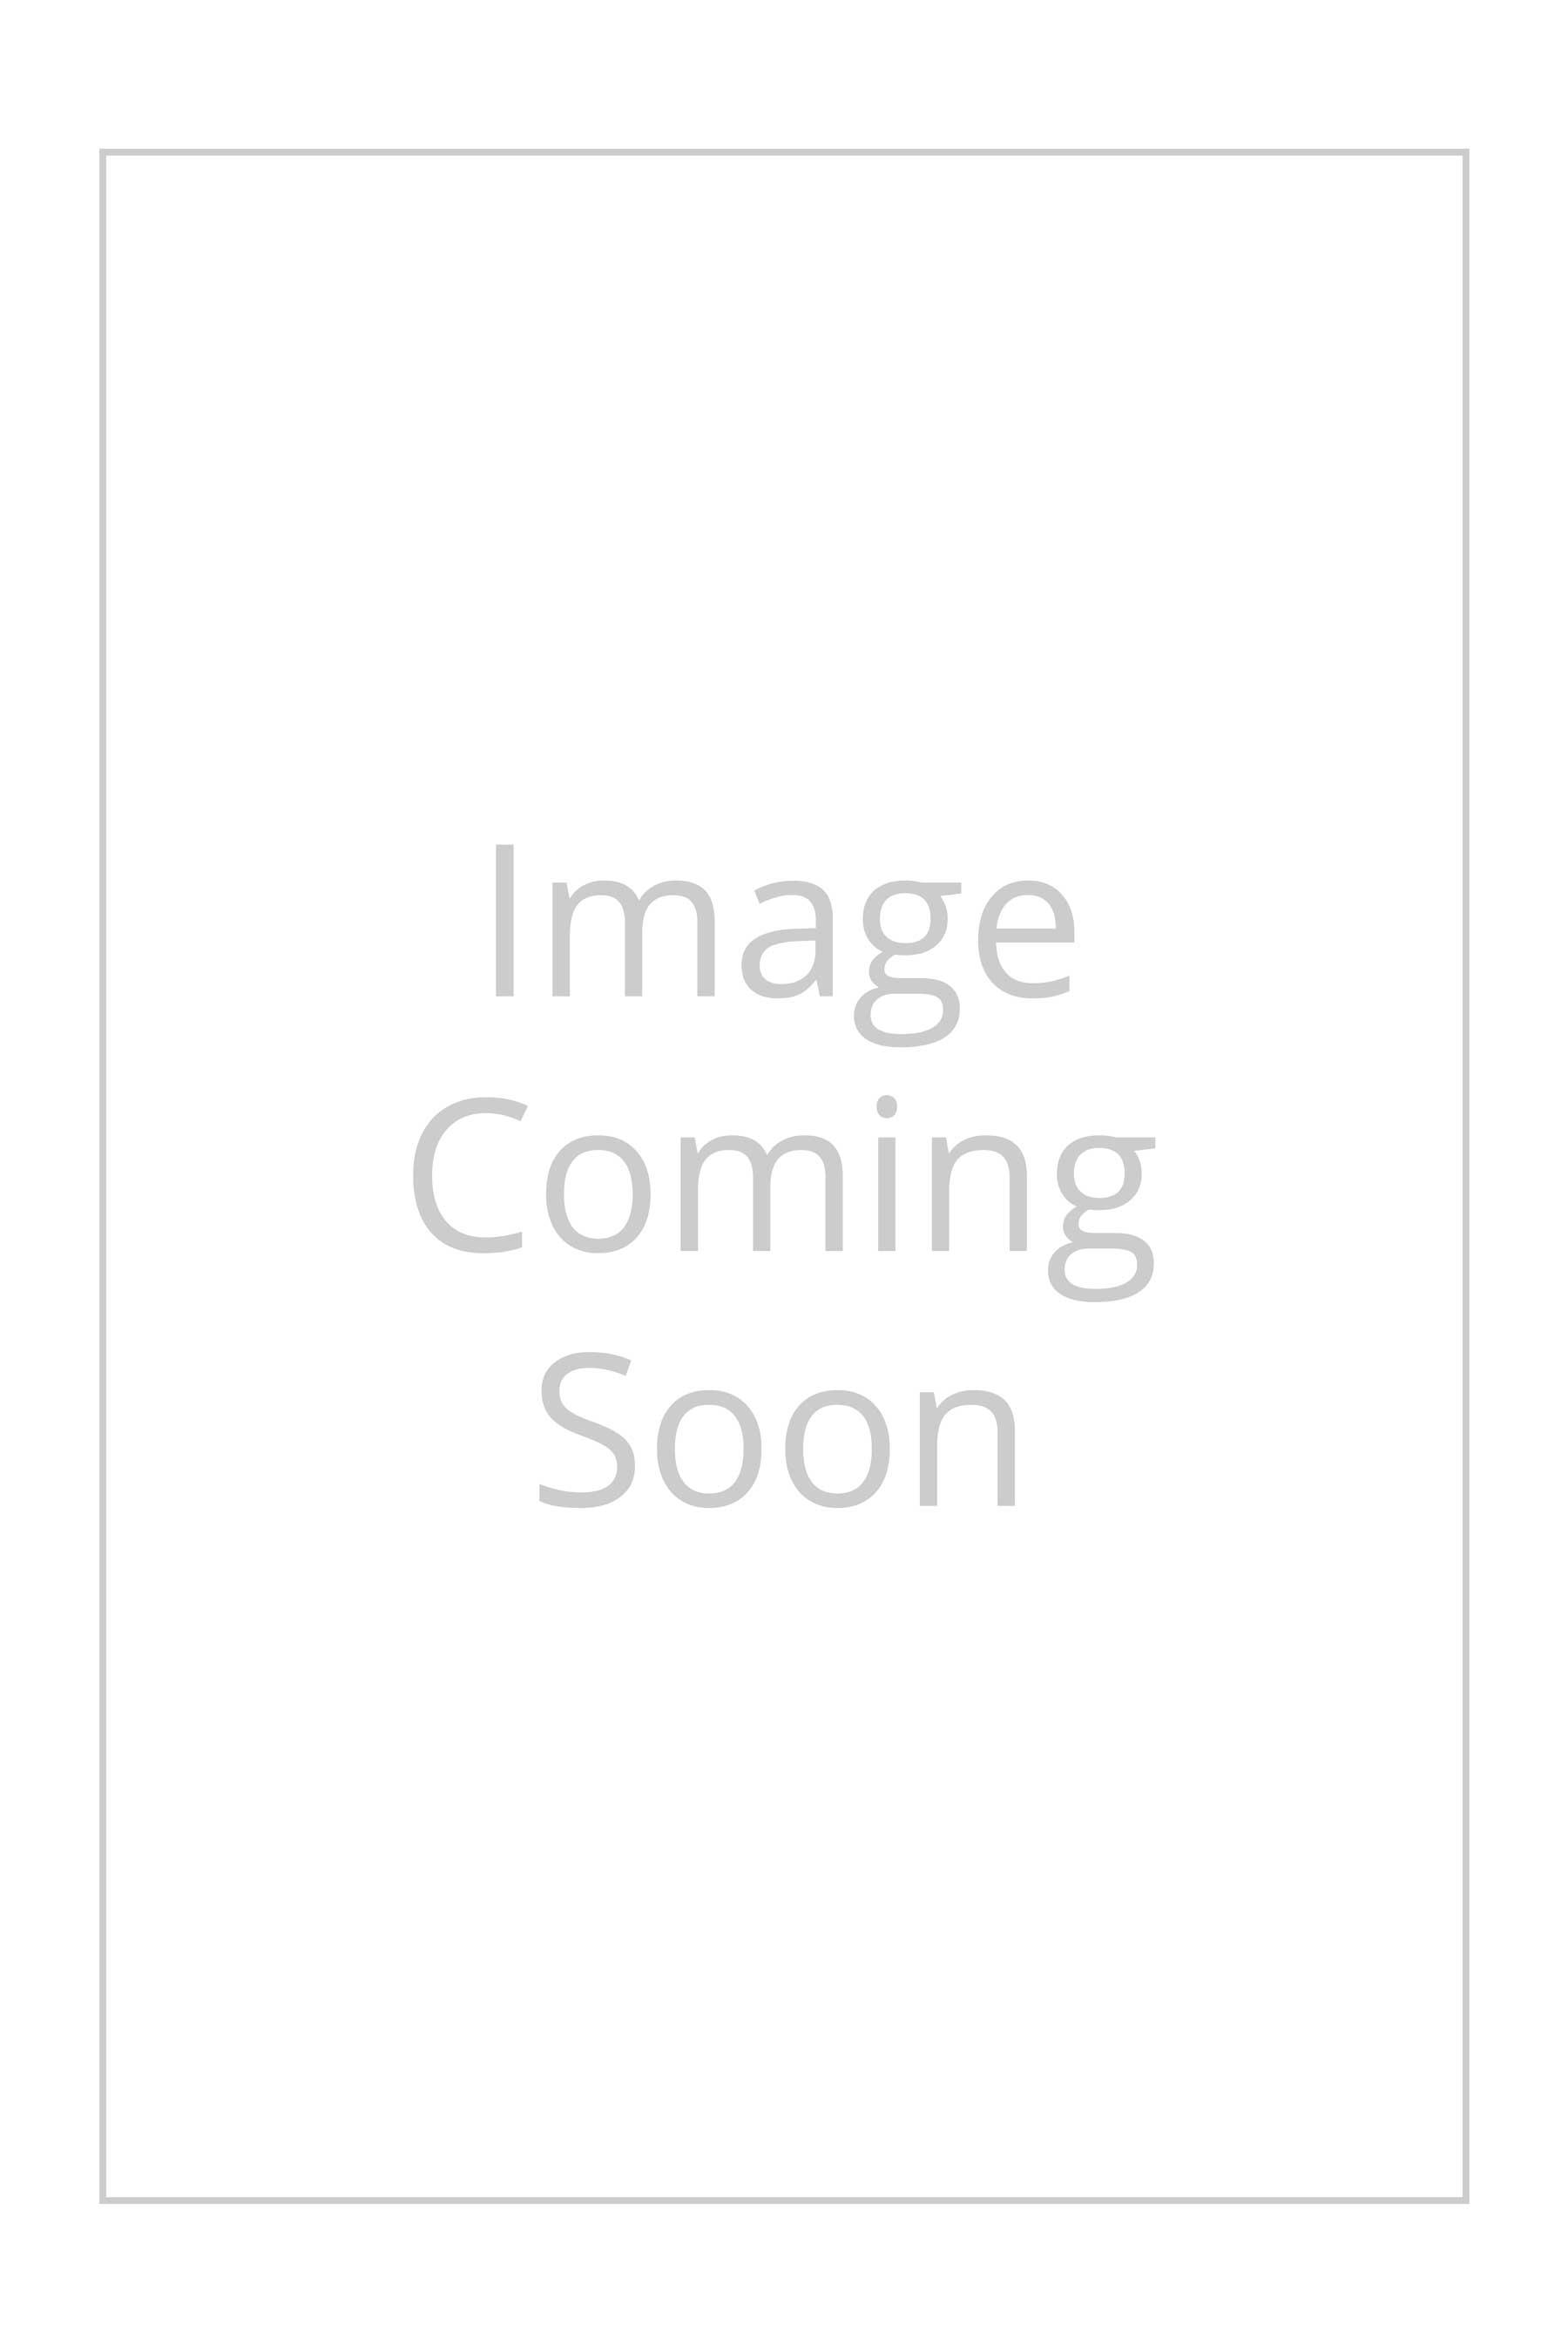 Giorgio Armani Sheer Silver Knit Top